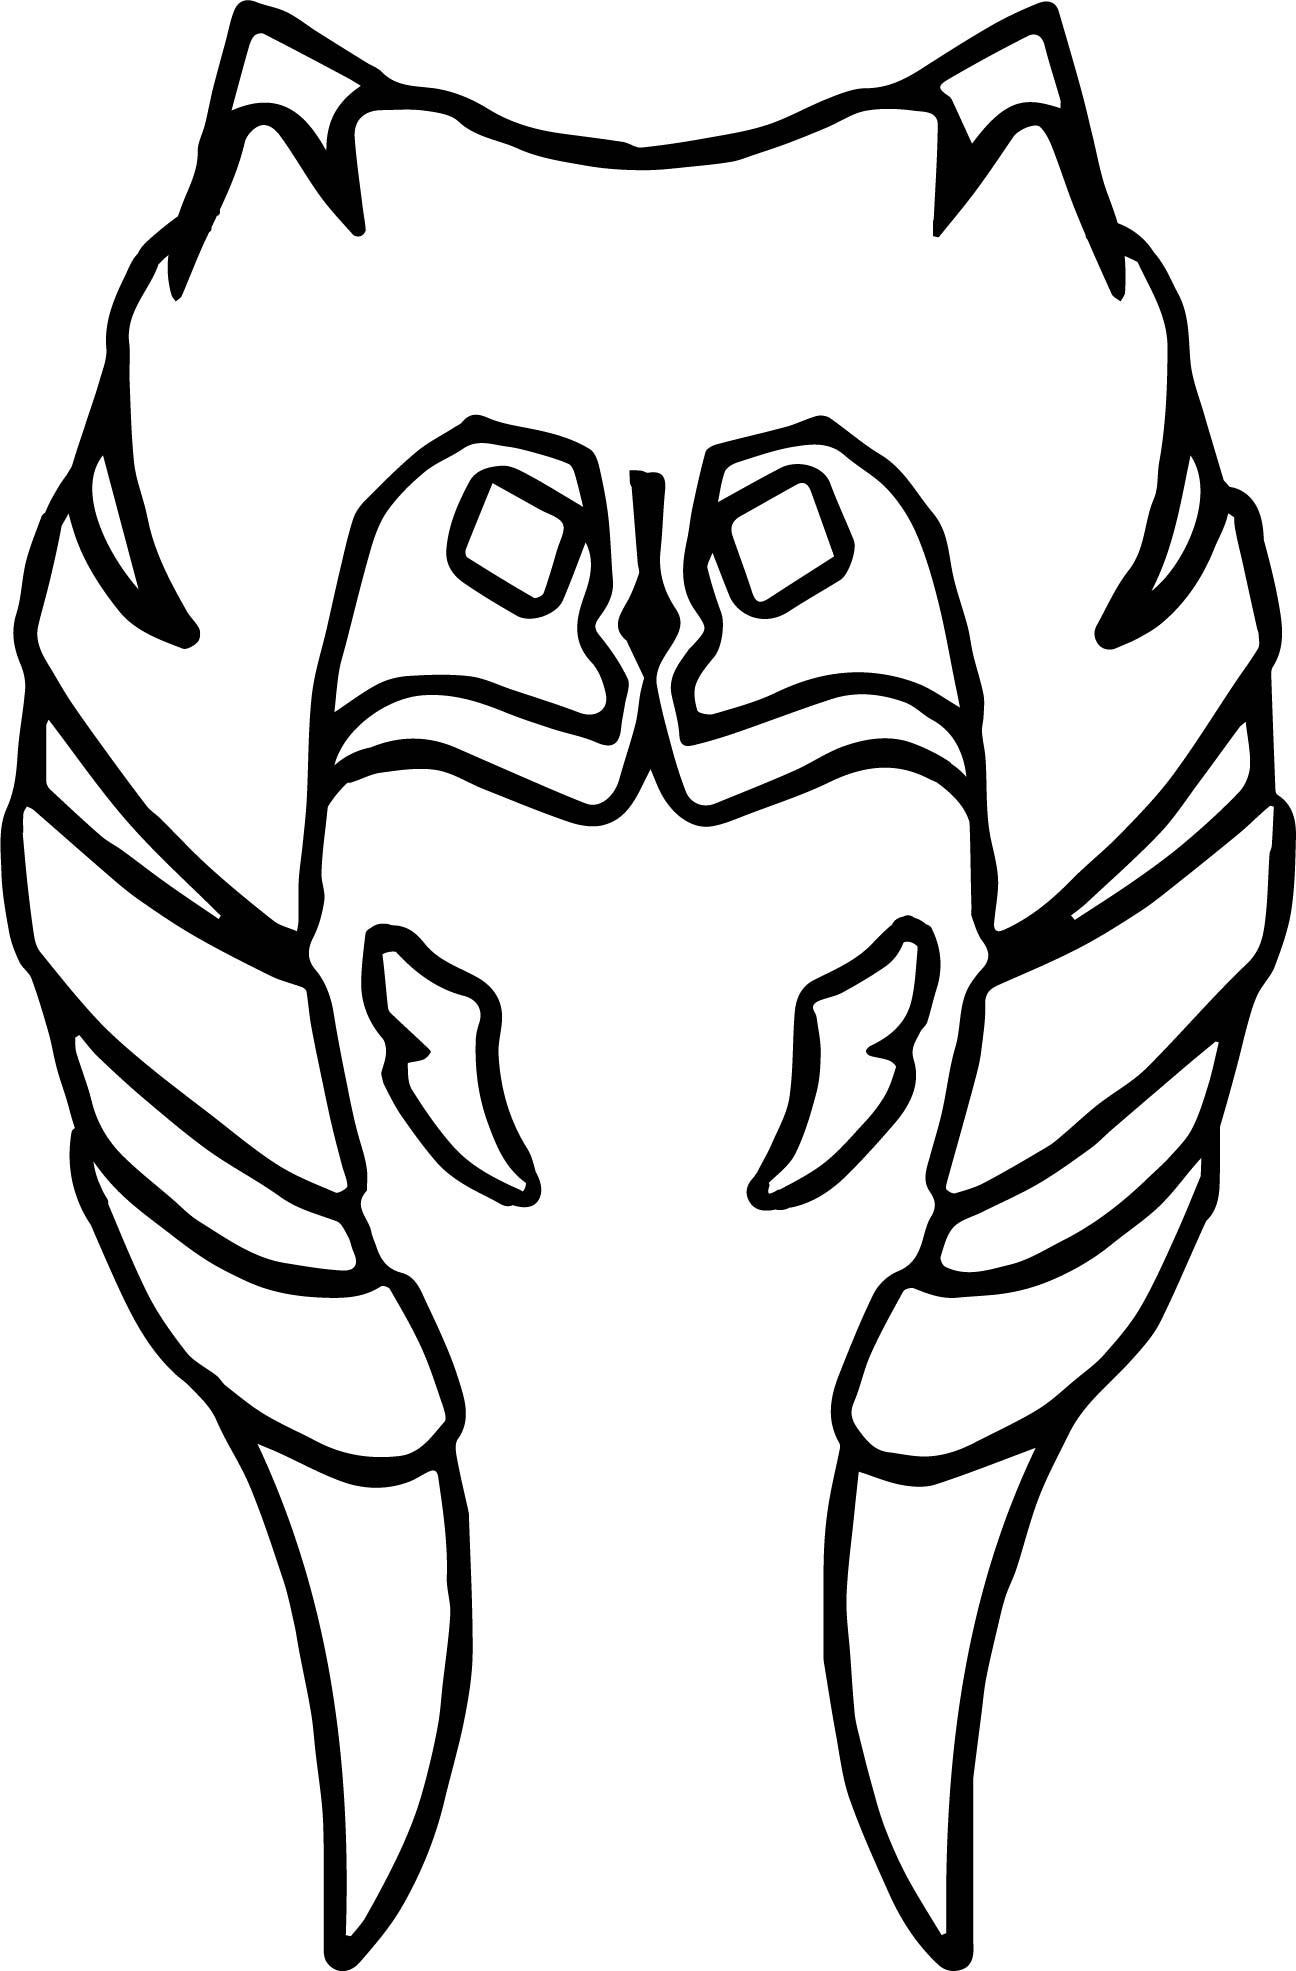 Ahsoka Tano Head Guard Coloring Page